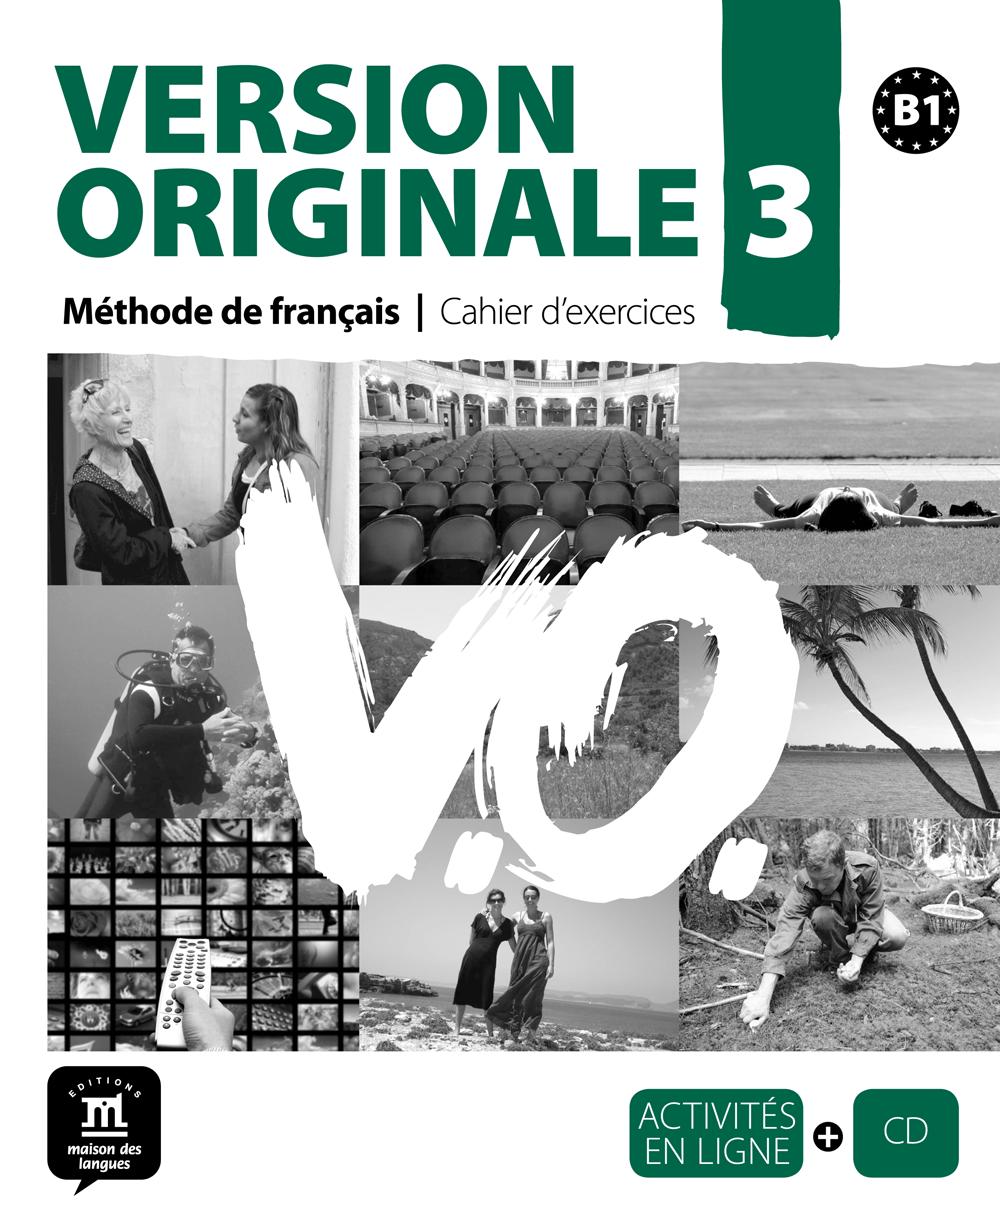 Version Originale 3 - Cahier d'exercices + CD audio